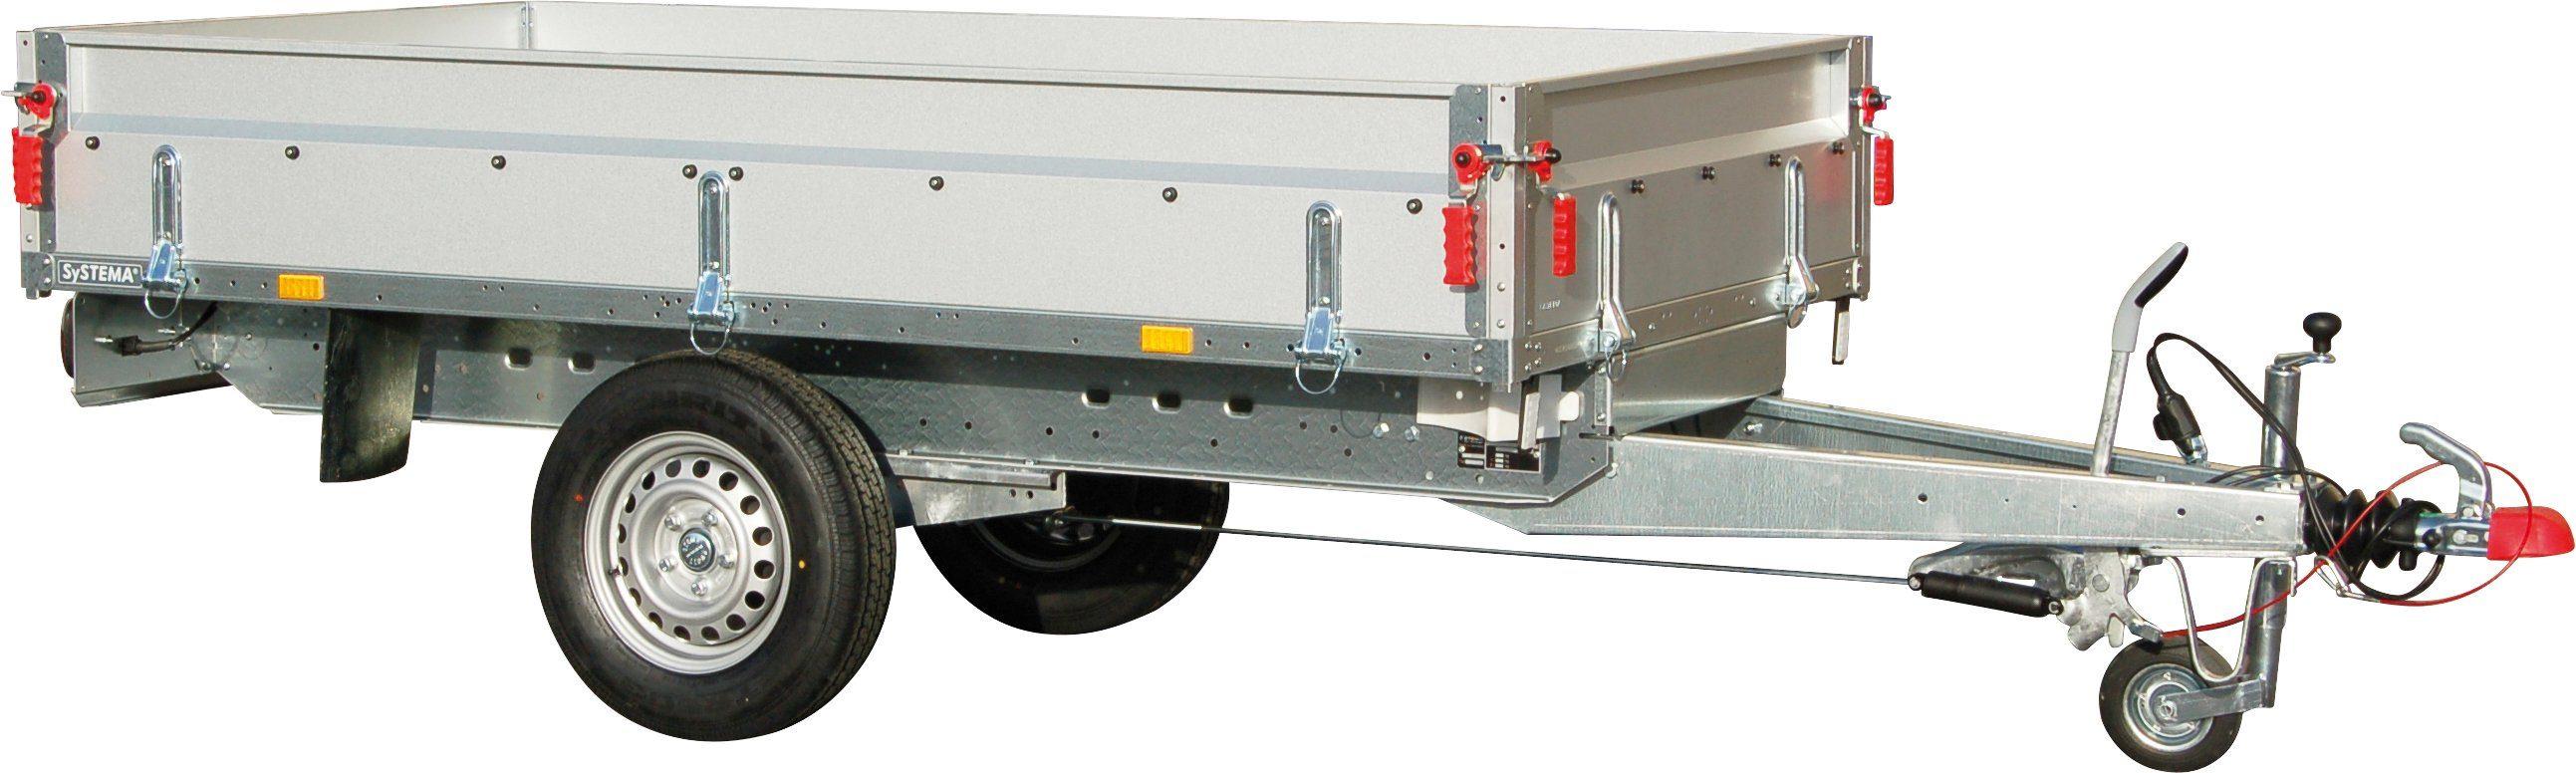 Stema PKW-Anhänger »BASIC SH 1300-25-13«